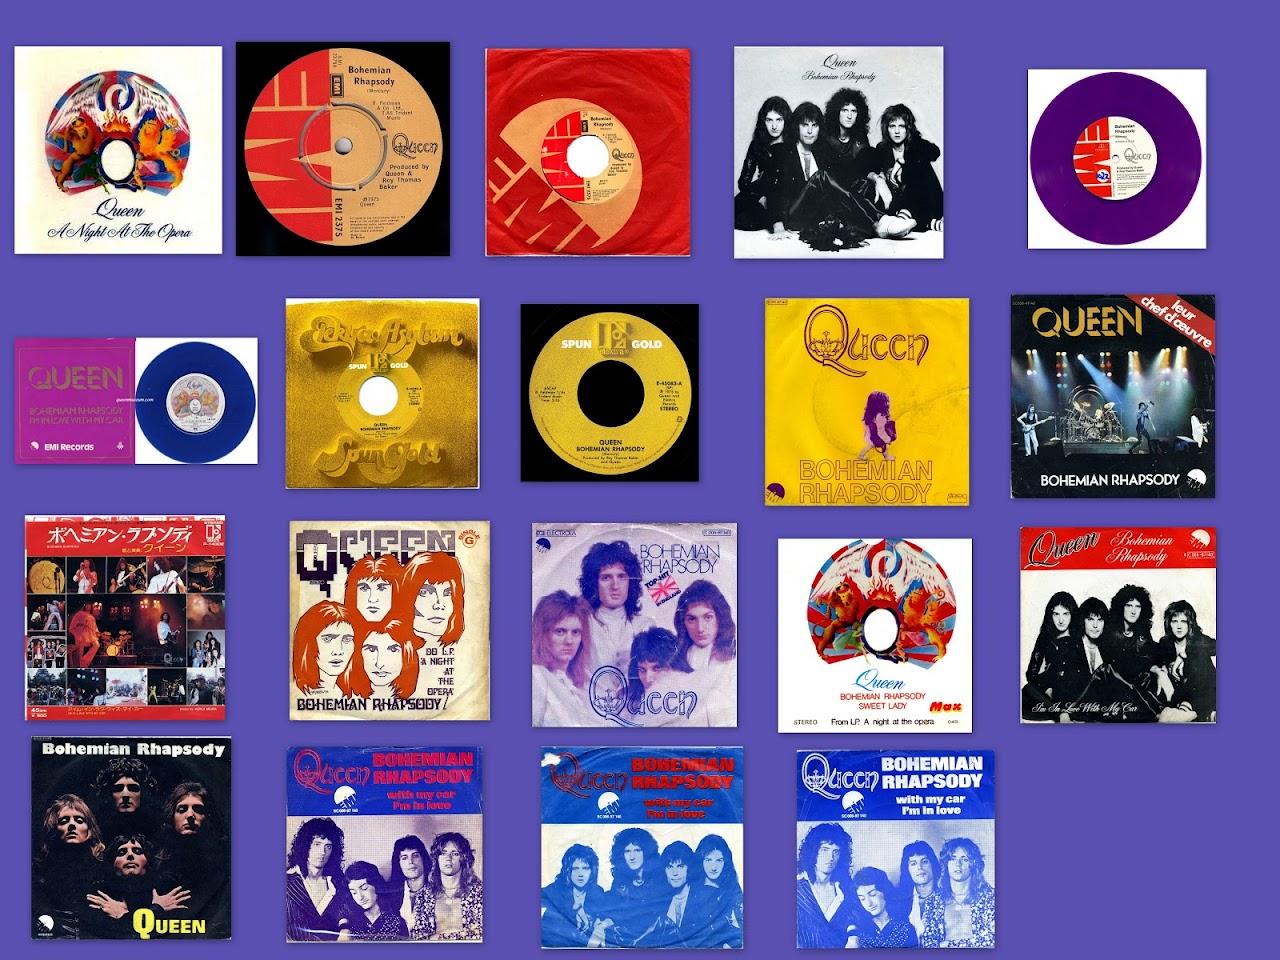 http://1.bp.blogspot.com/_YVc1x5PguVM/TNzeWy8xR2I/AAAAAAAAAxQ/YY2pgDp4CZc/s1280/Queen+%2528Singles+Bohemian+Rhapsody%2529.jpg